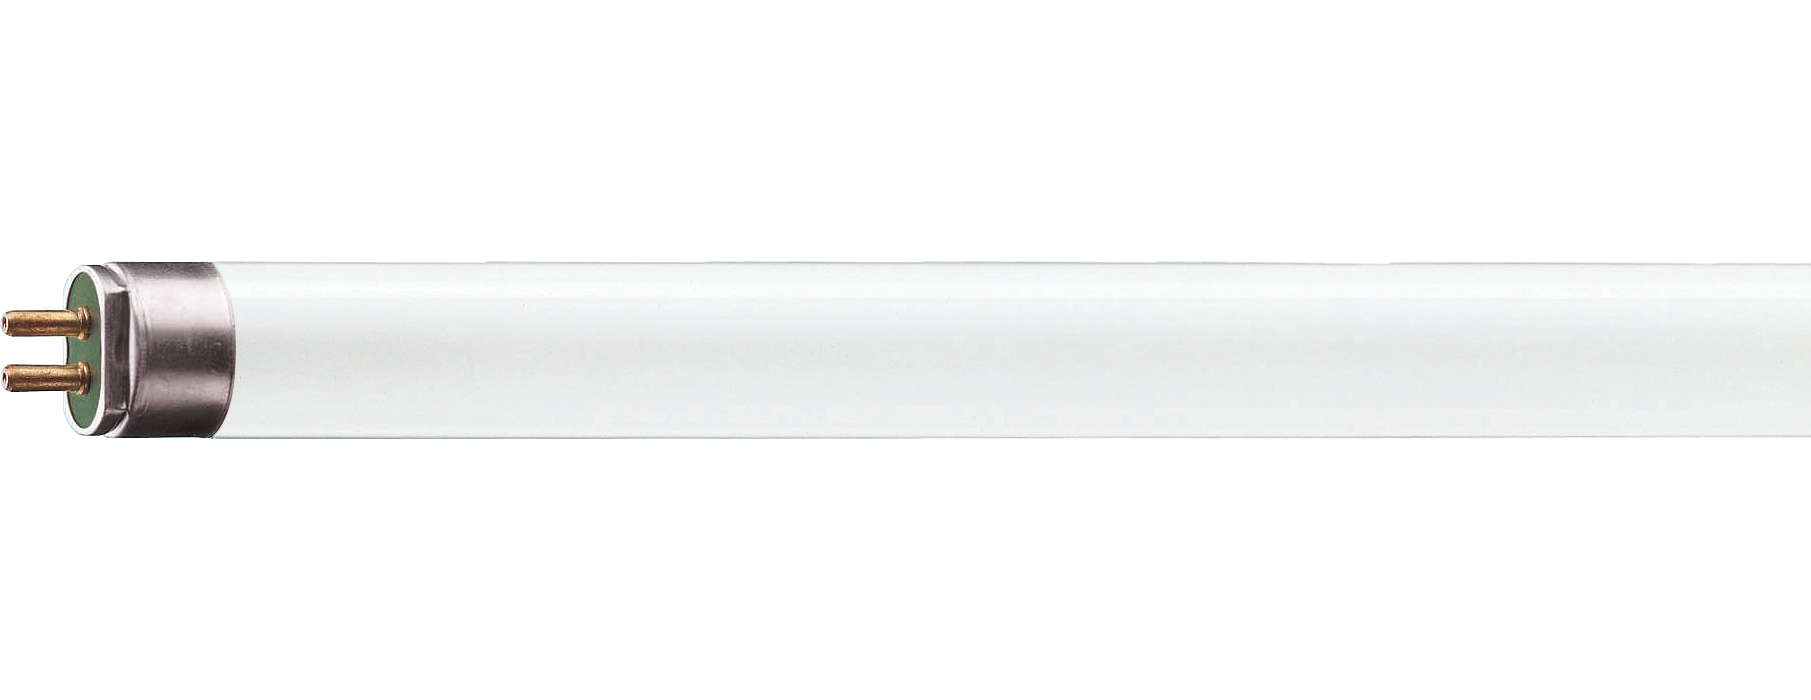 Powerful, environmentally-responsible ultra-slim lamps